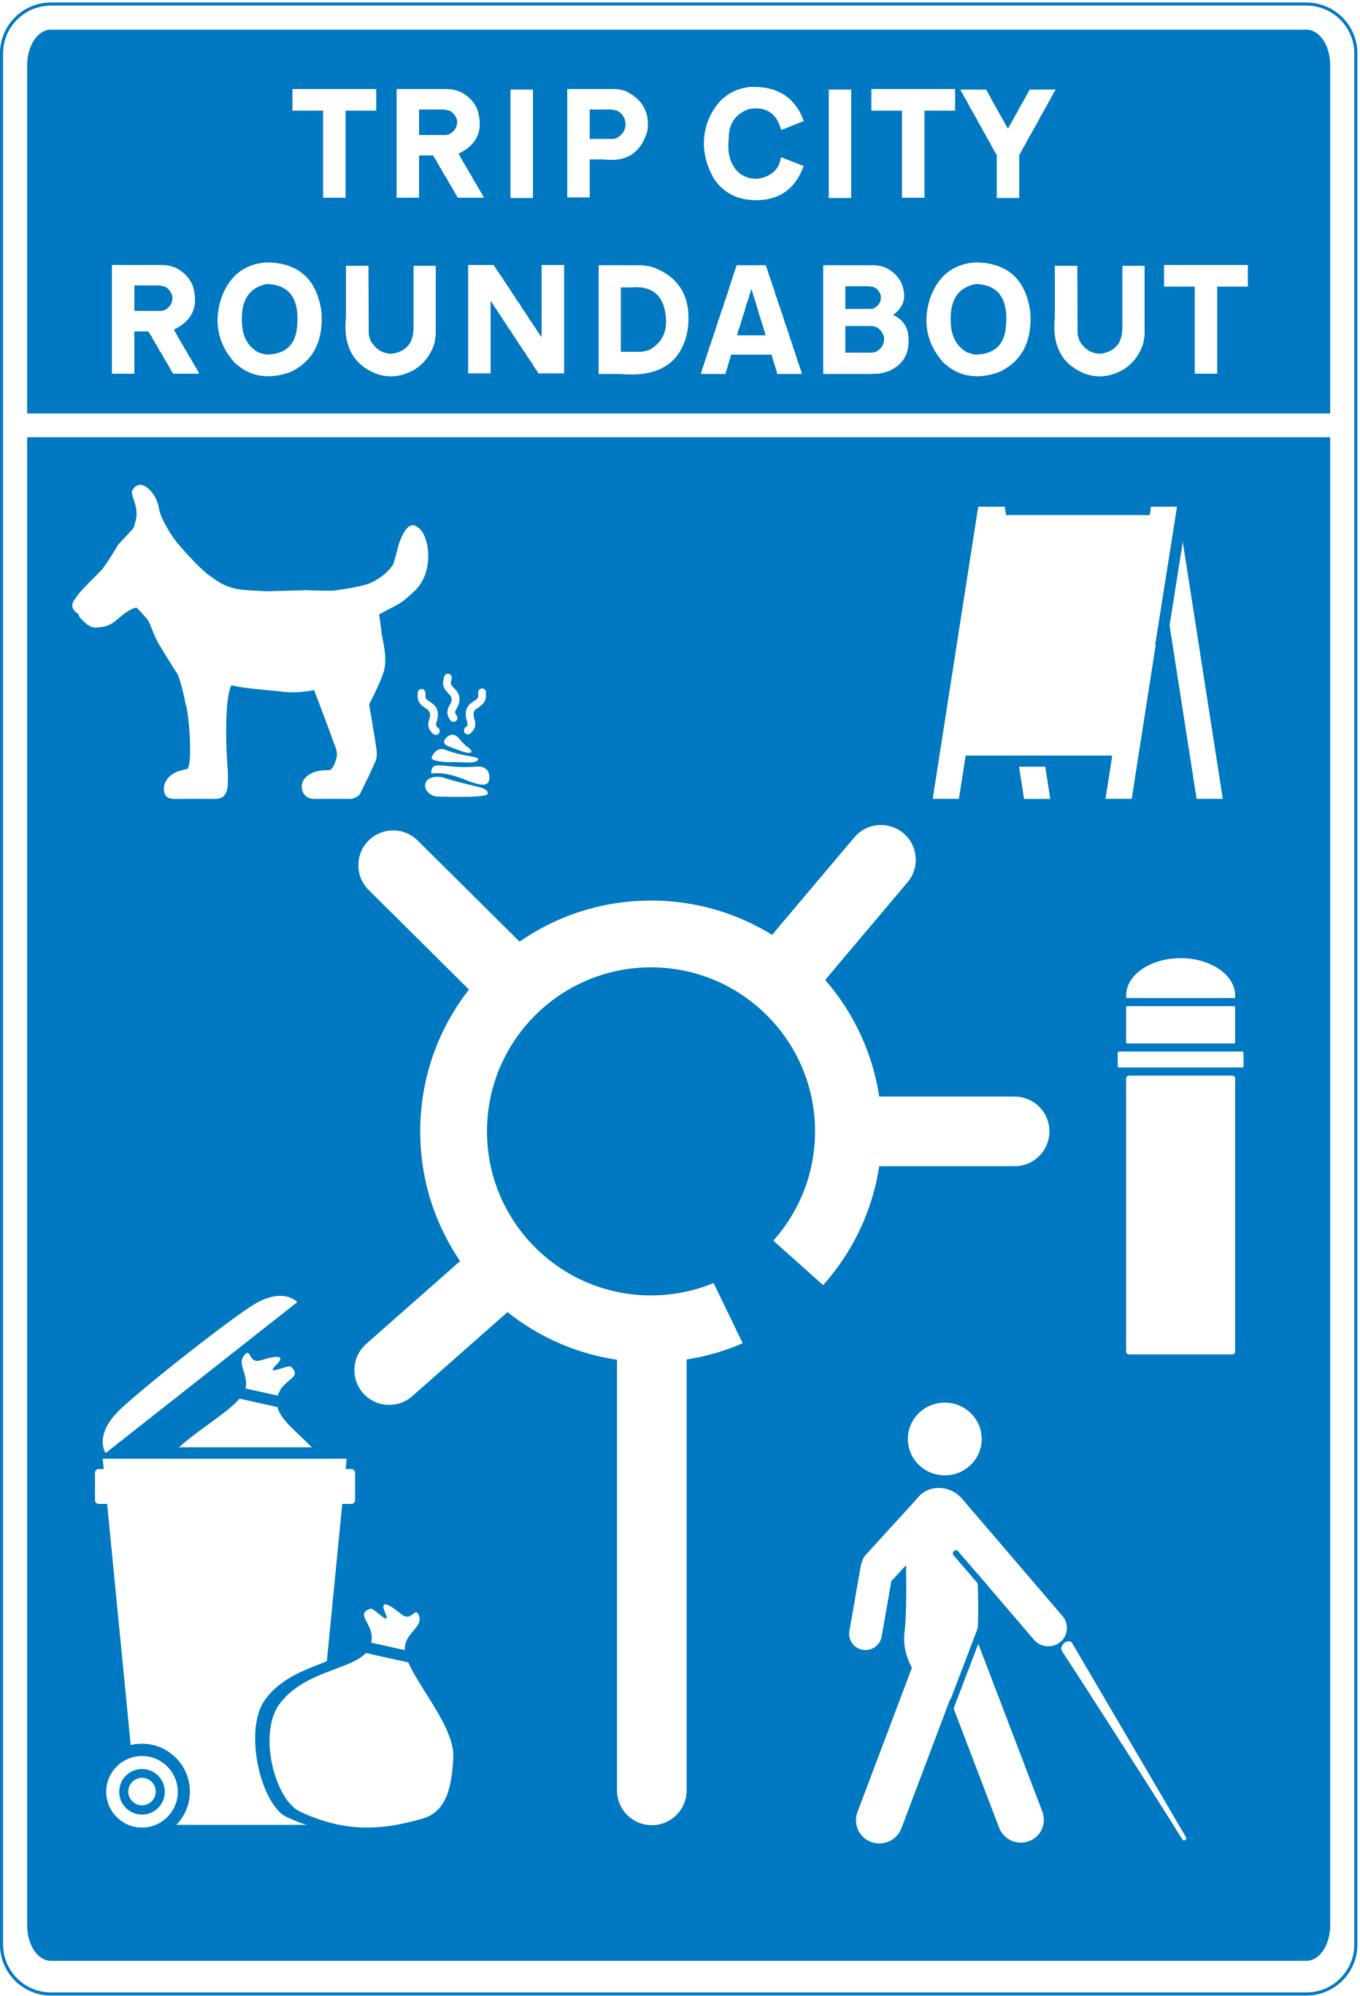 Trip City Roundabout